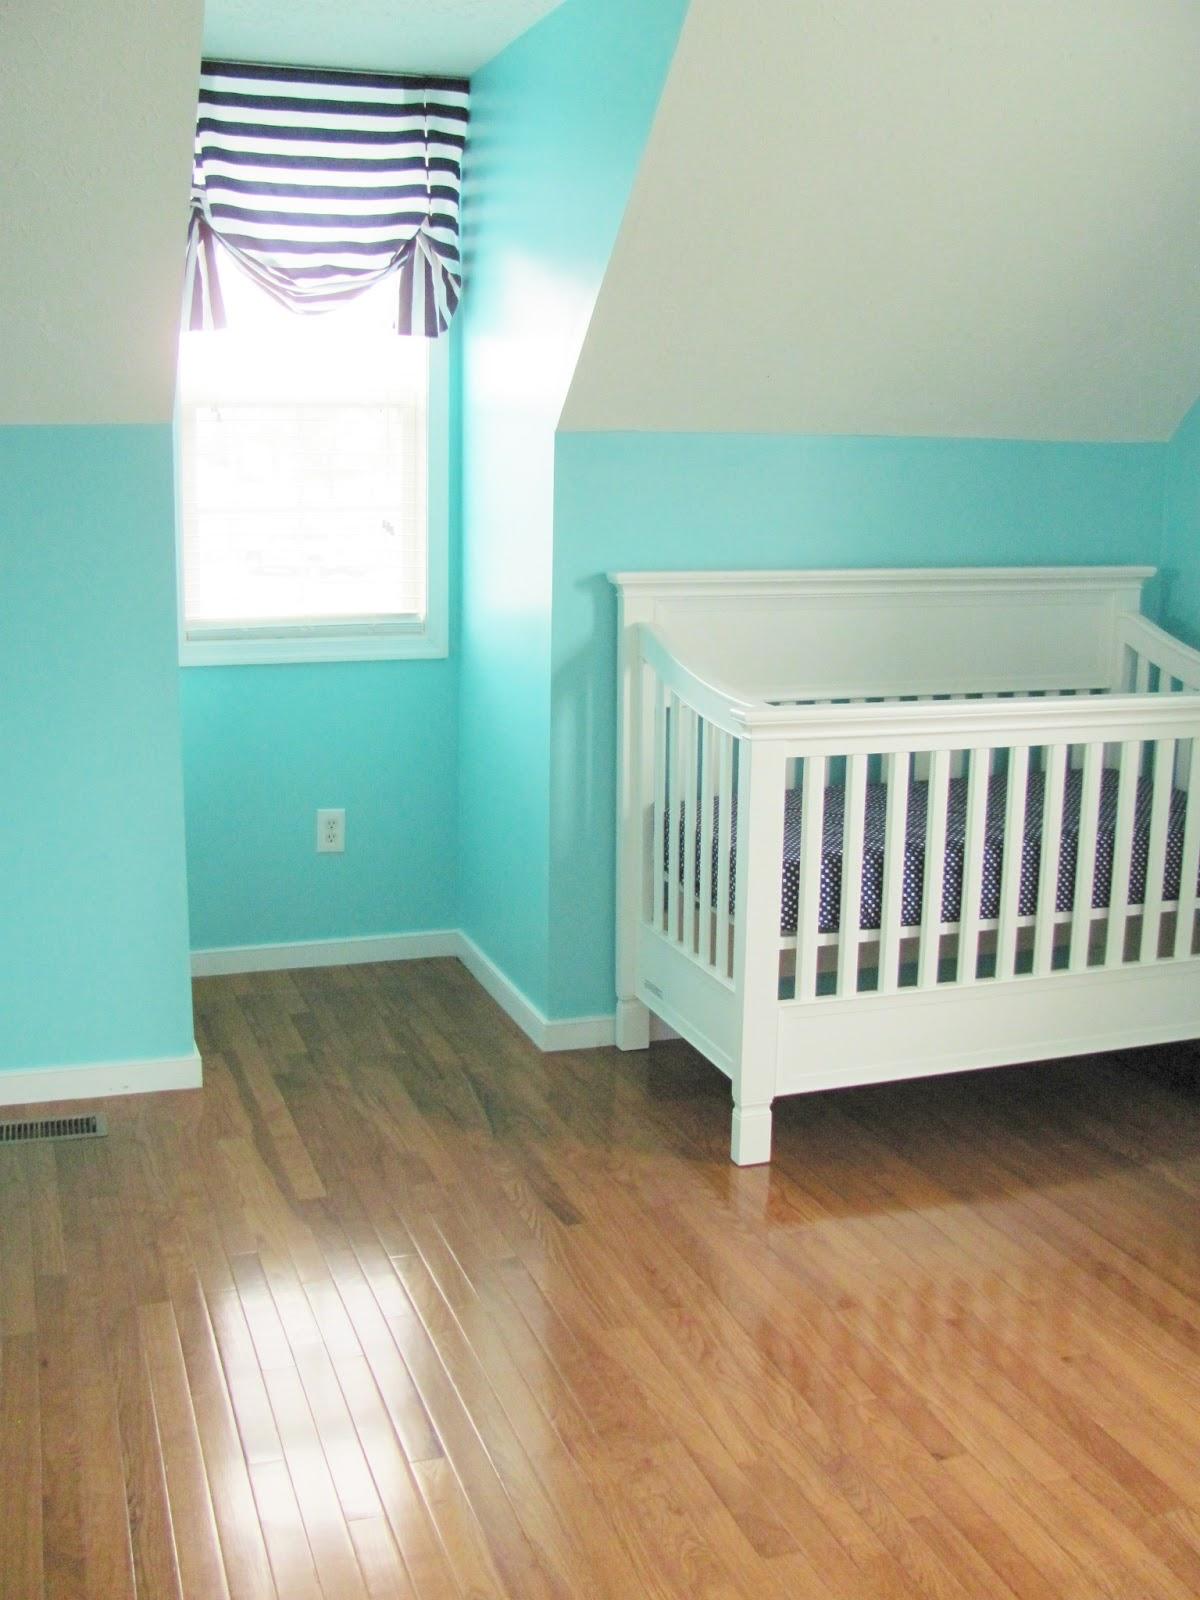 Hardwood Floors And Getting Crafty In The Nursery